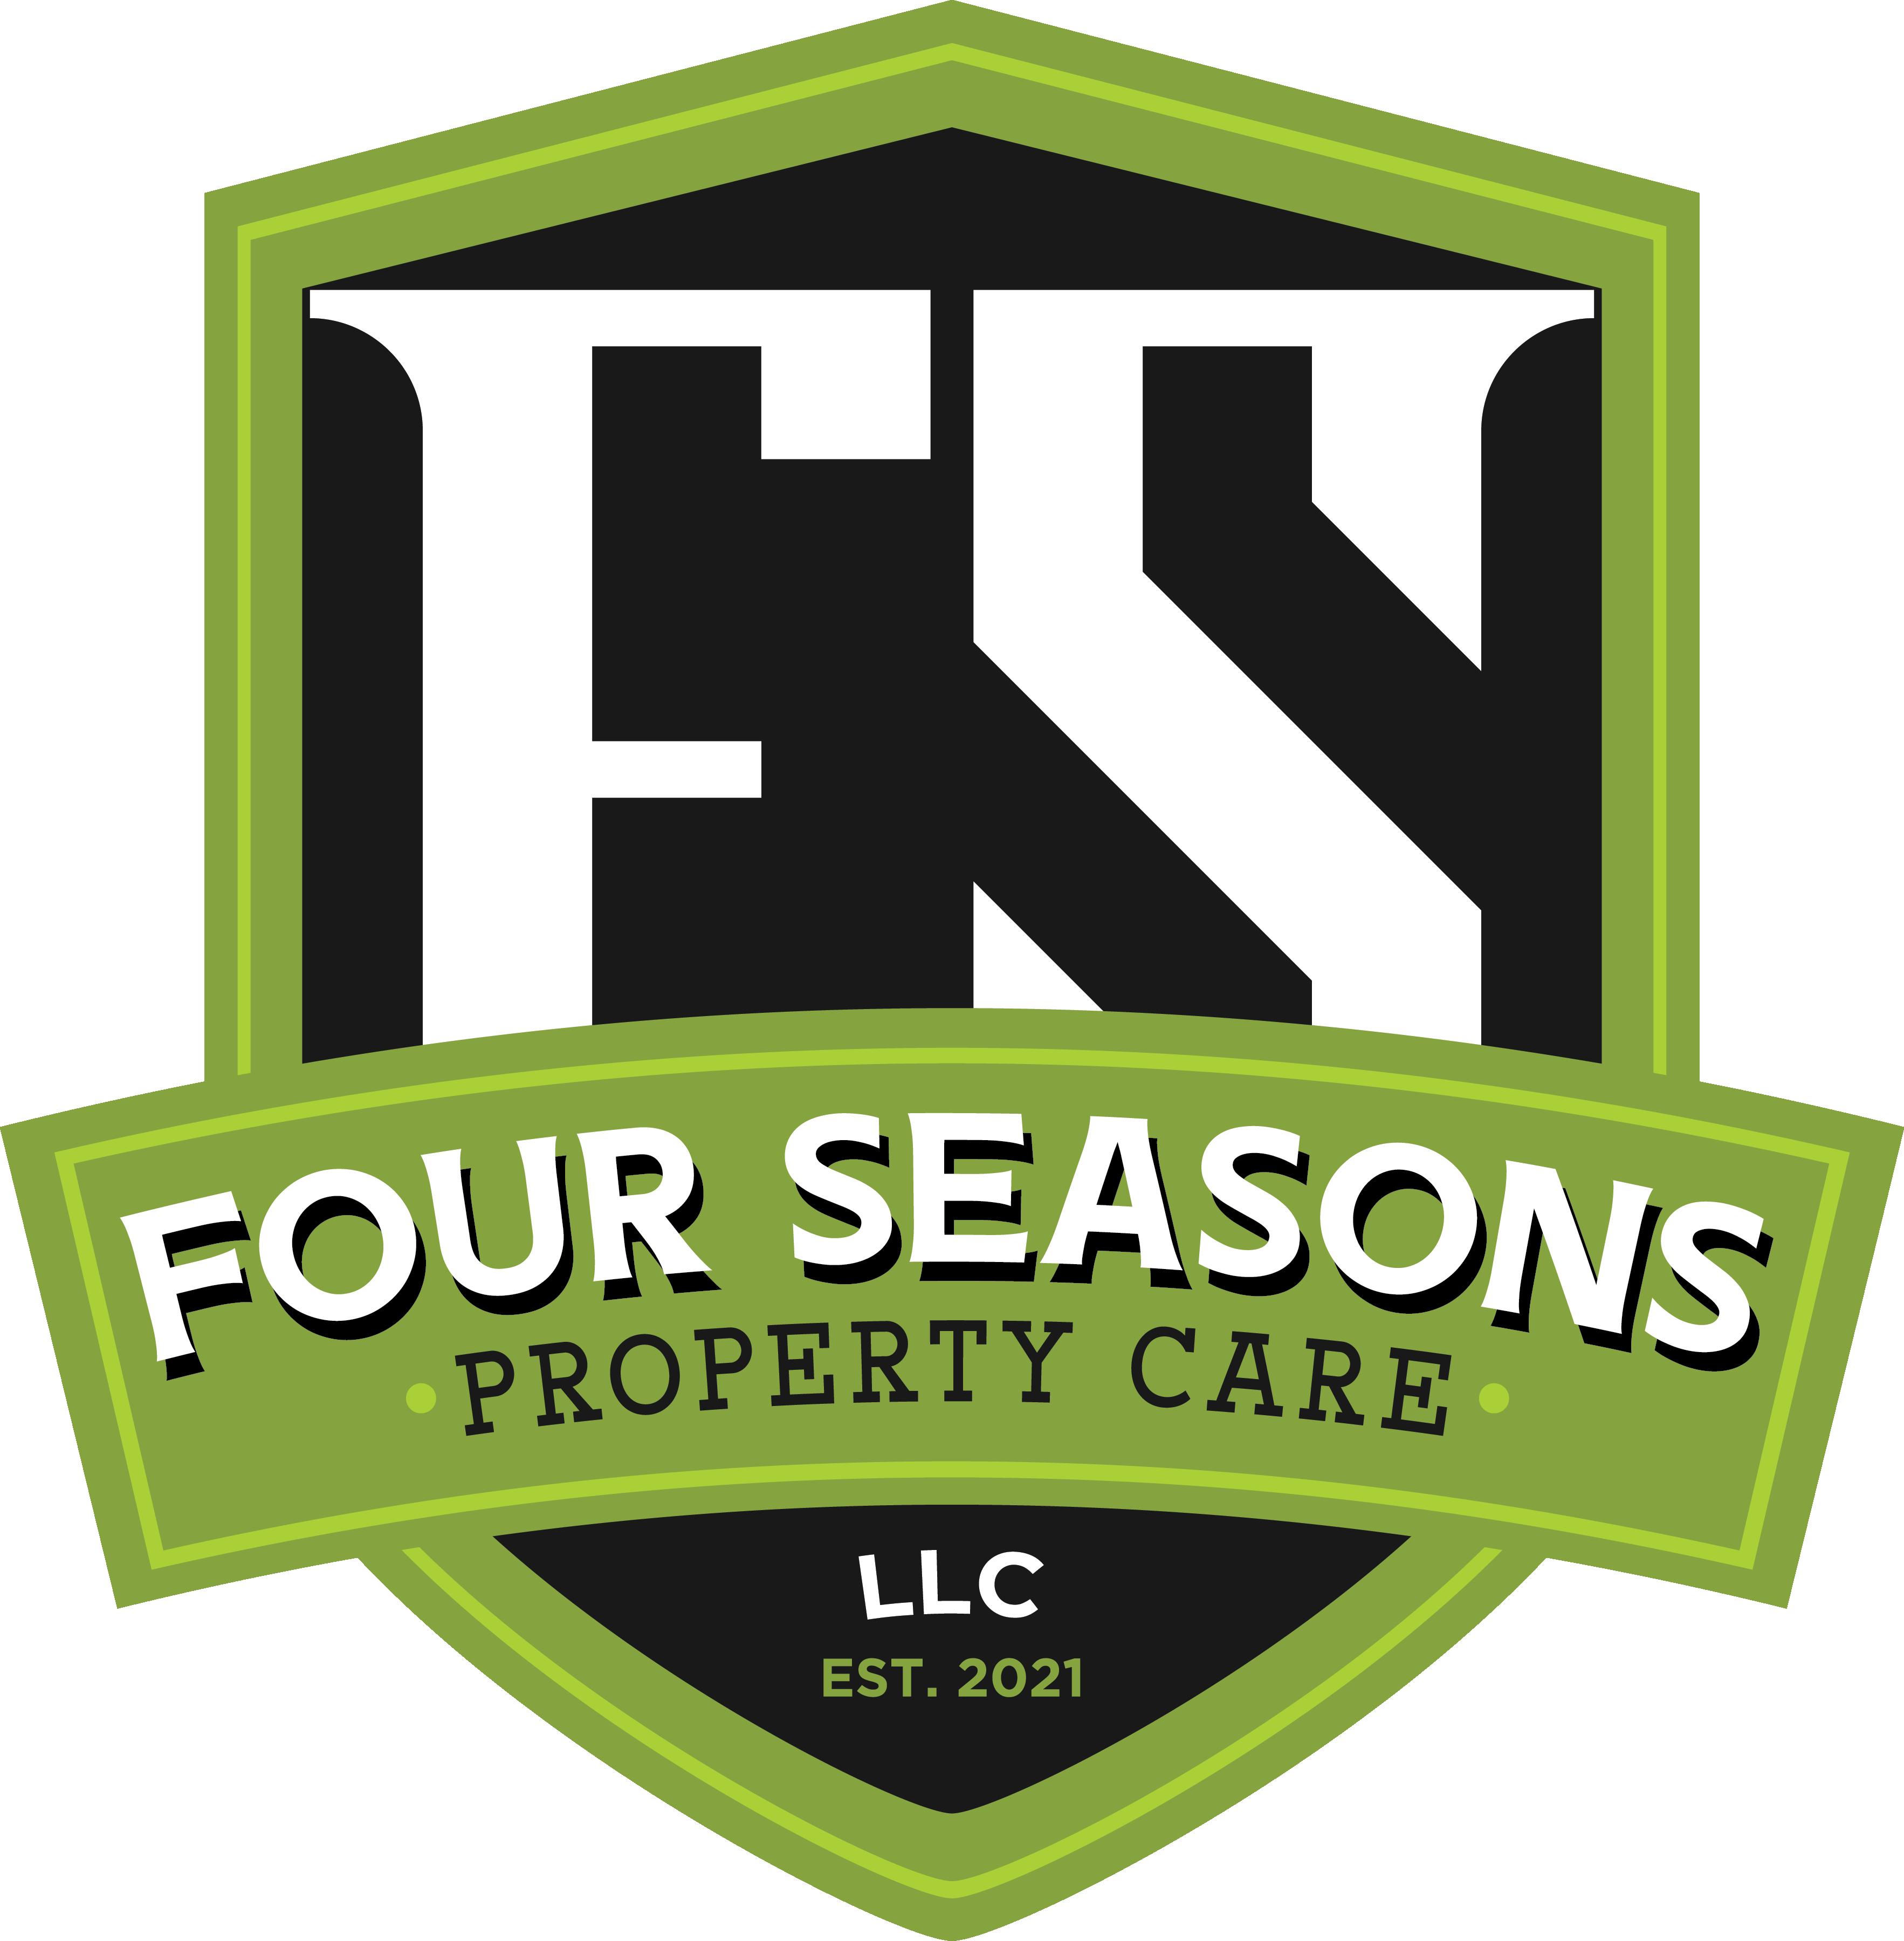 Four Seasons Property Care LLC